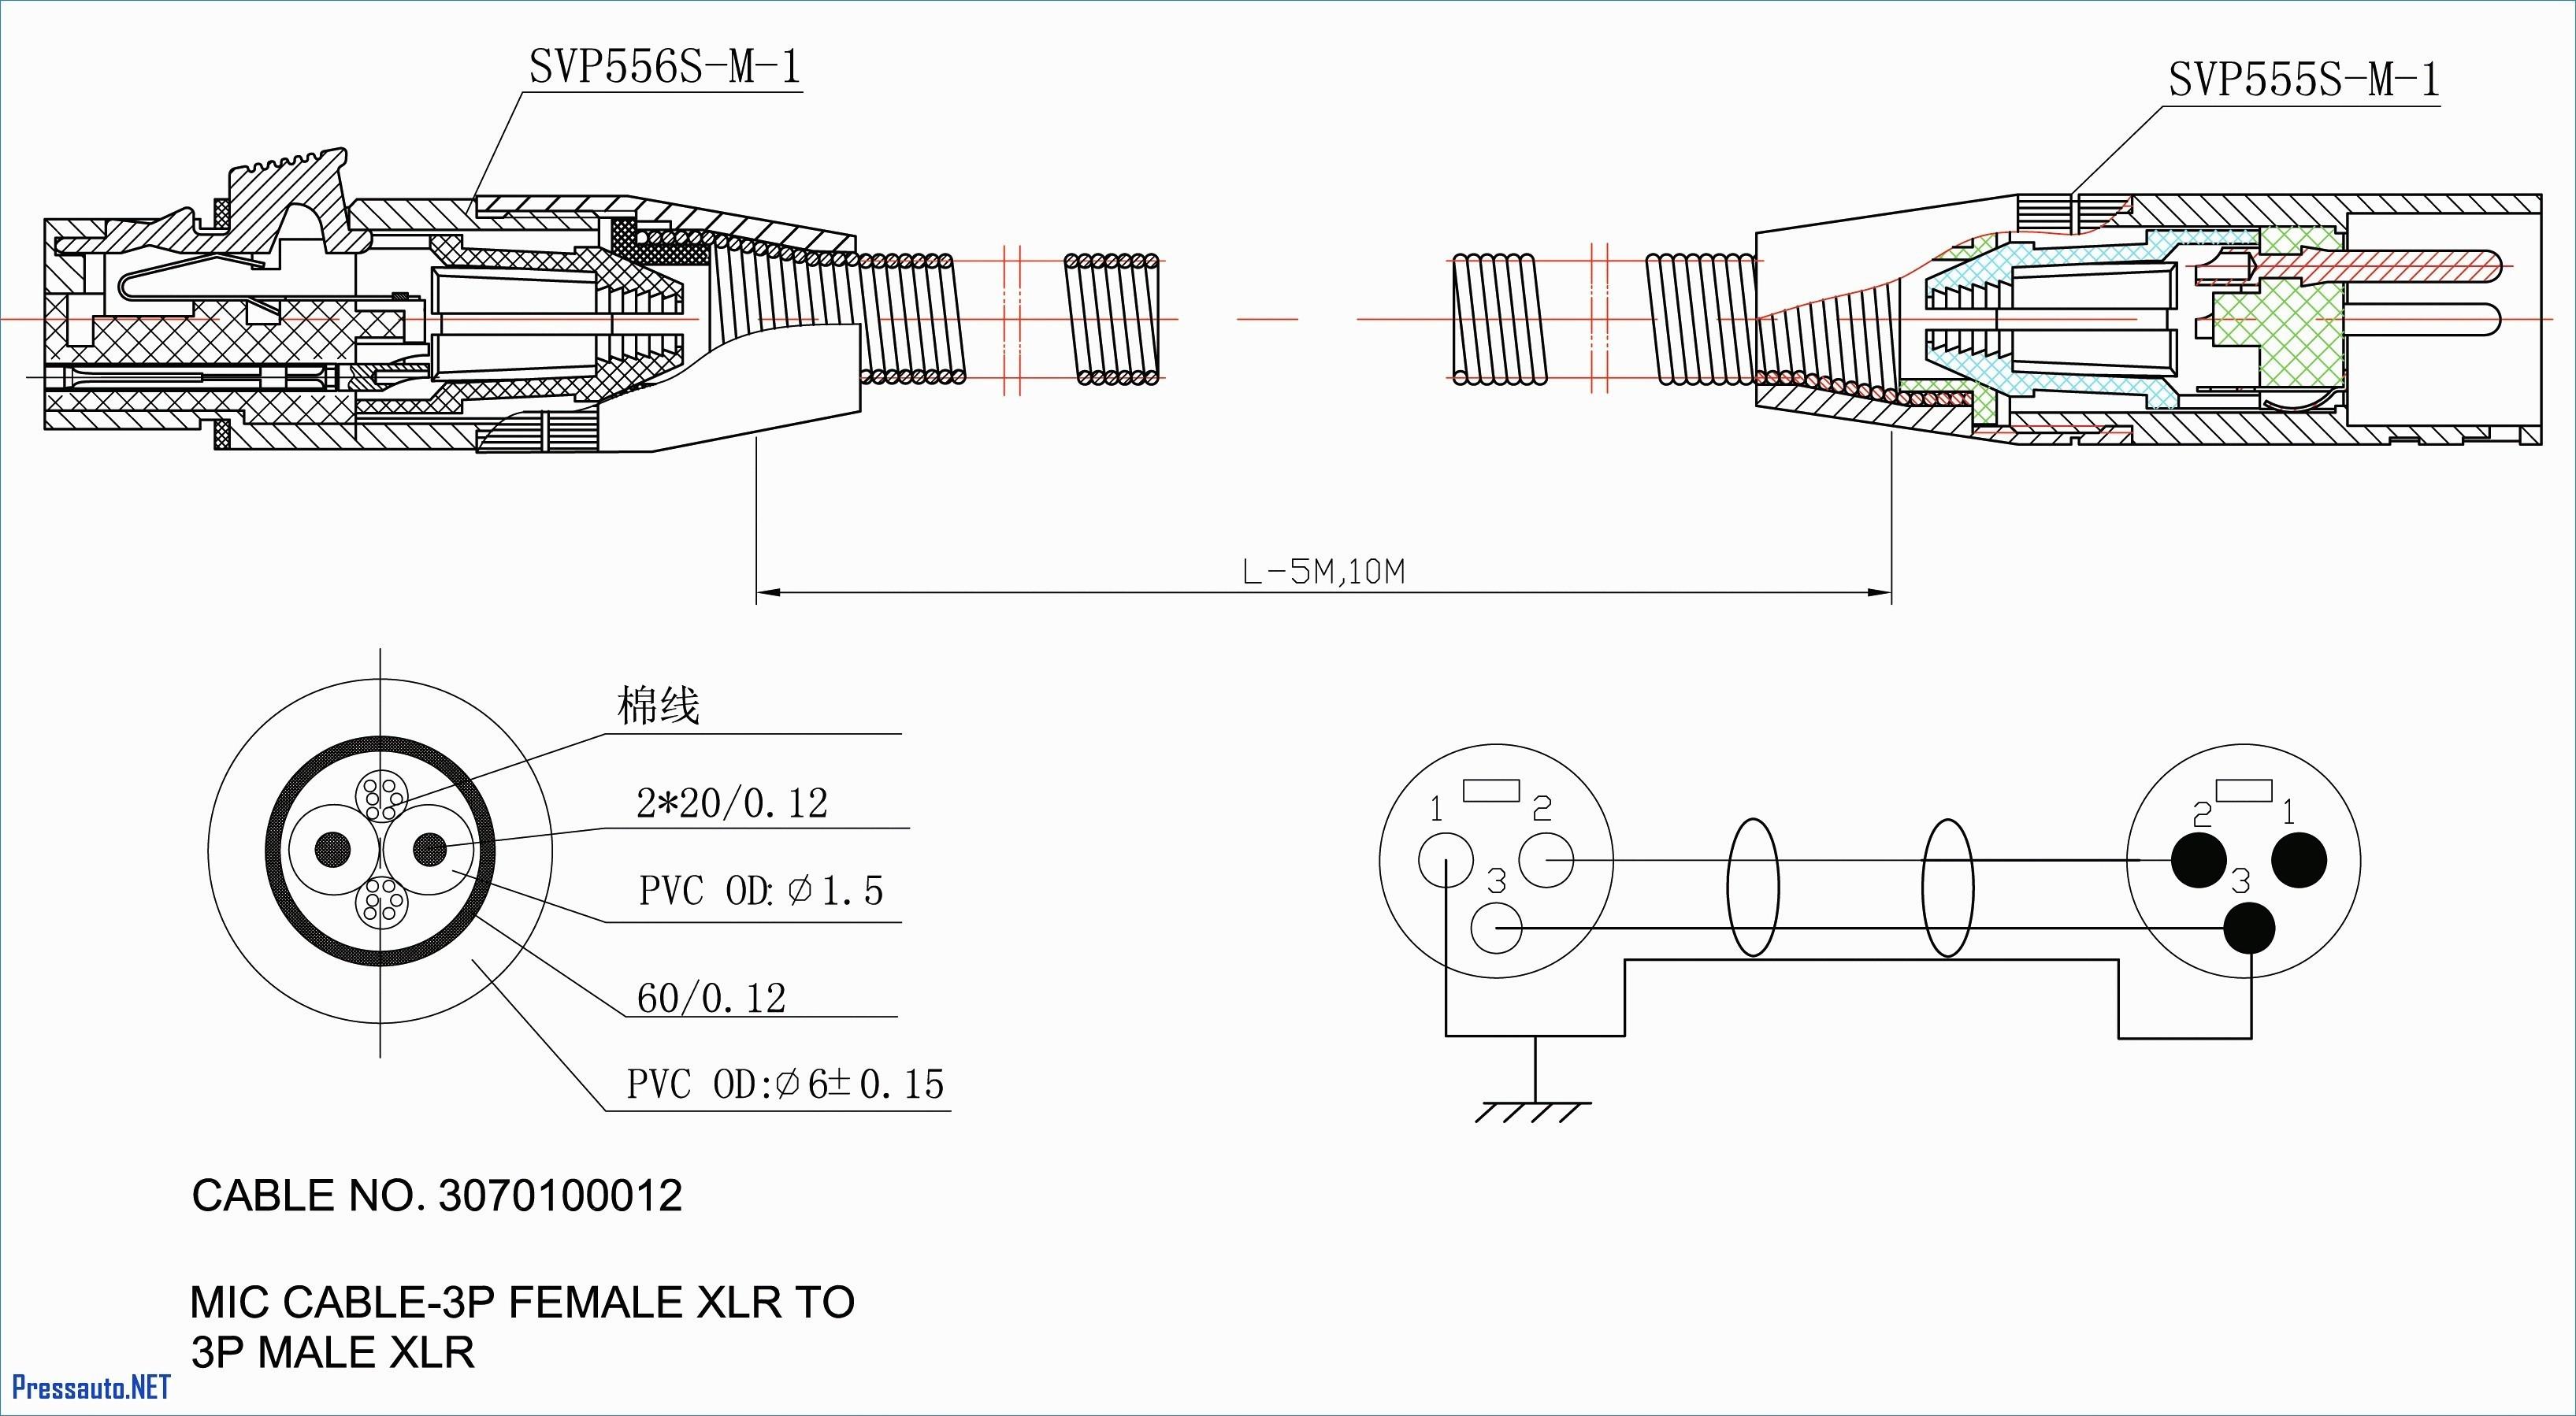 pt cruiser wiring diagram inspirational 2005 chrysler pacifica and wiring diagram best 2006 pt cruiser of pt cruiser wiring diagram